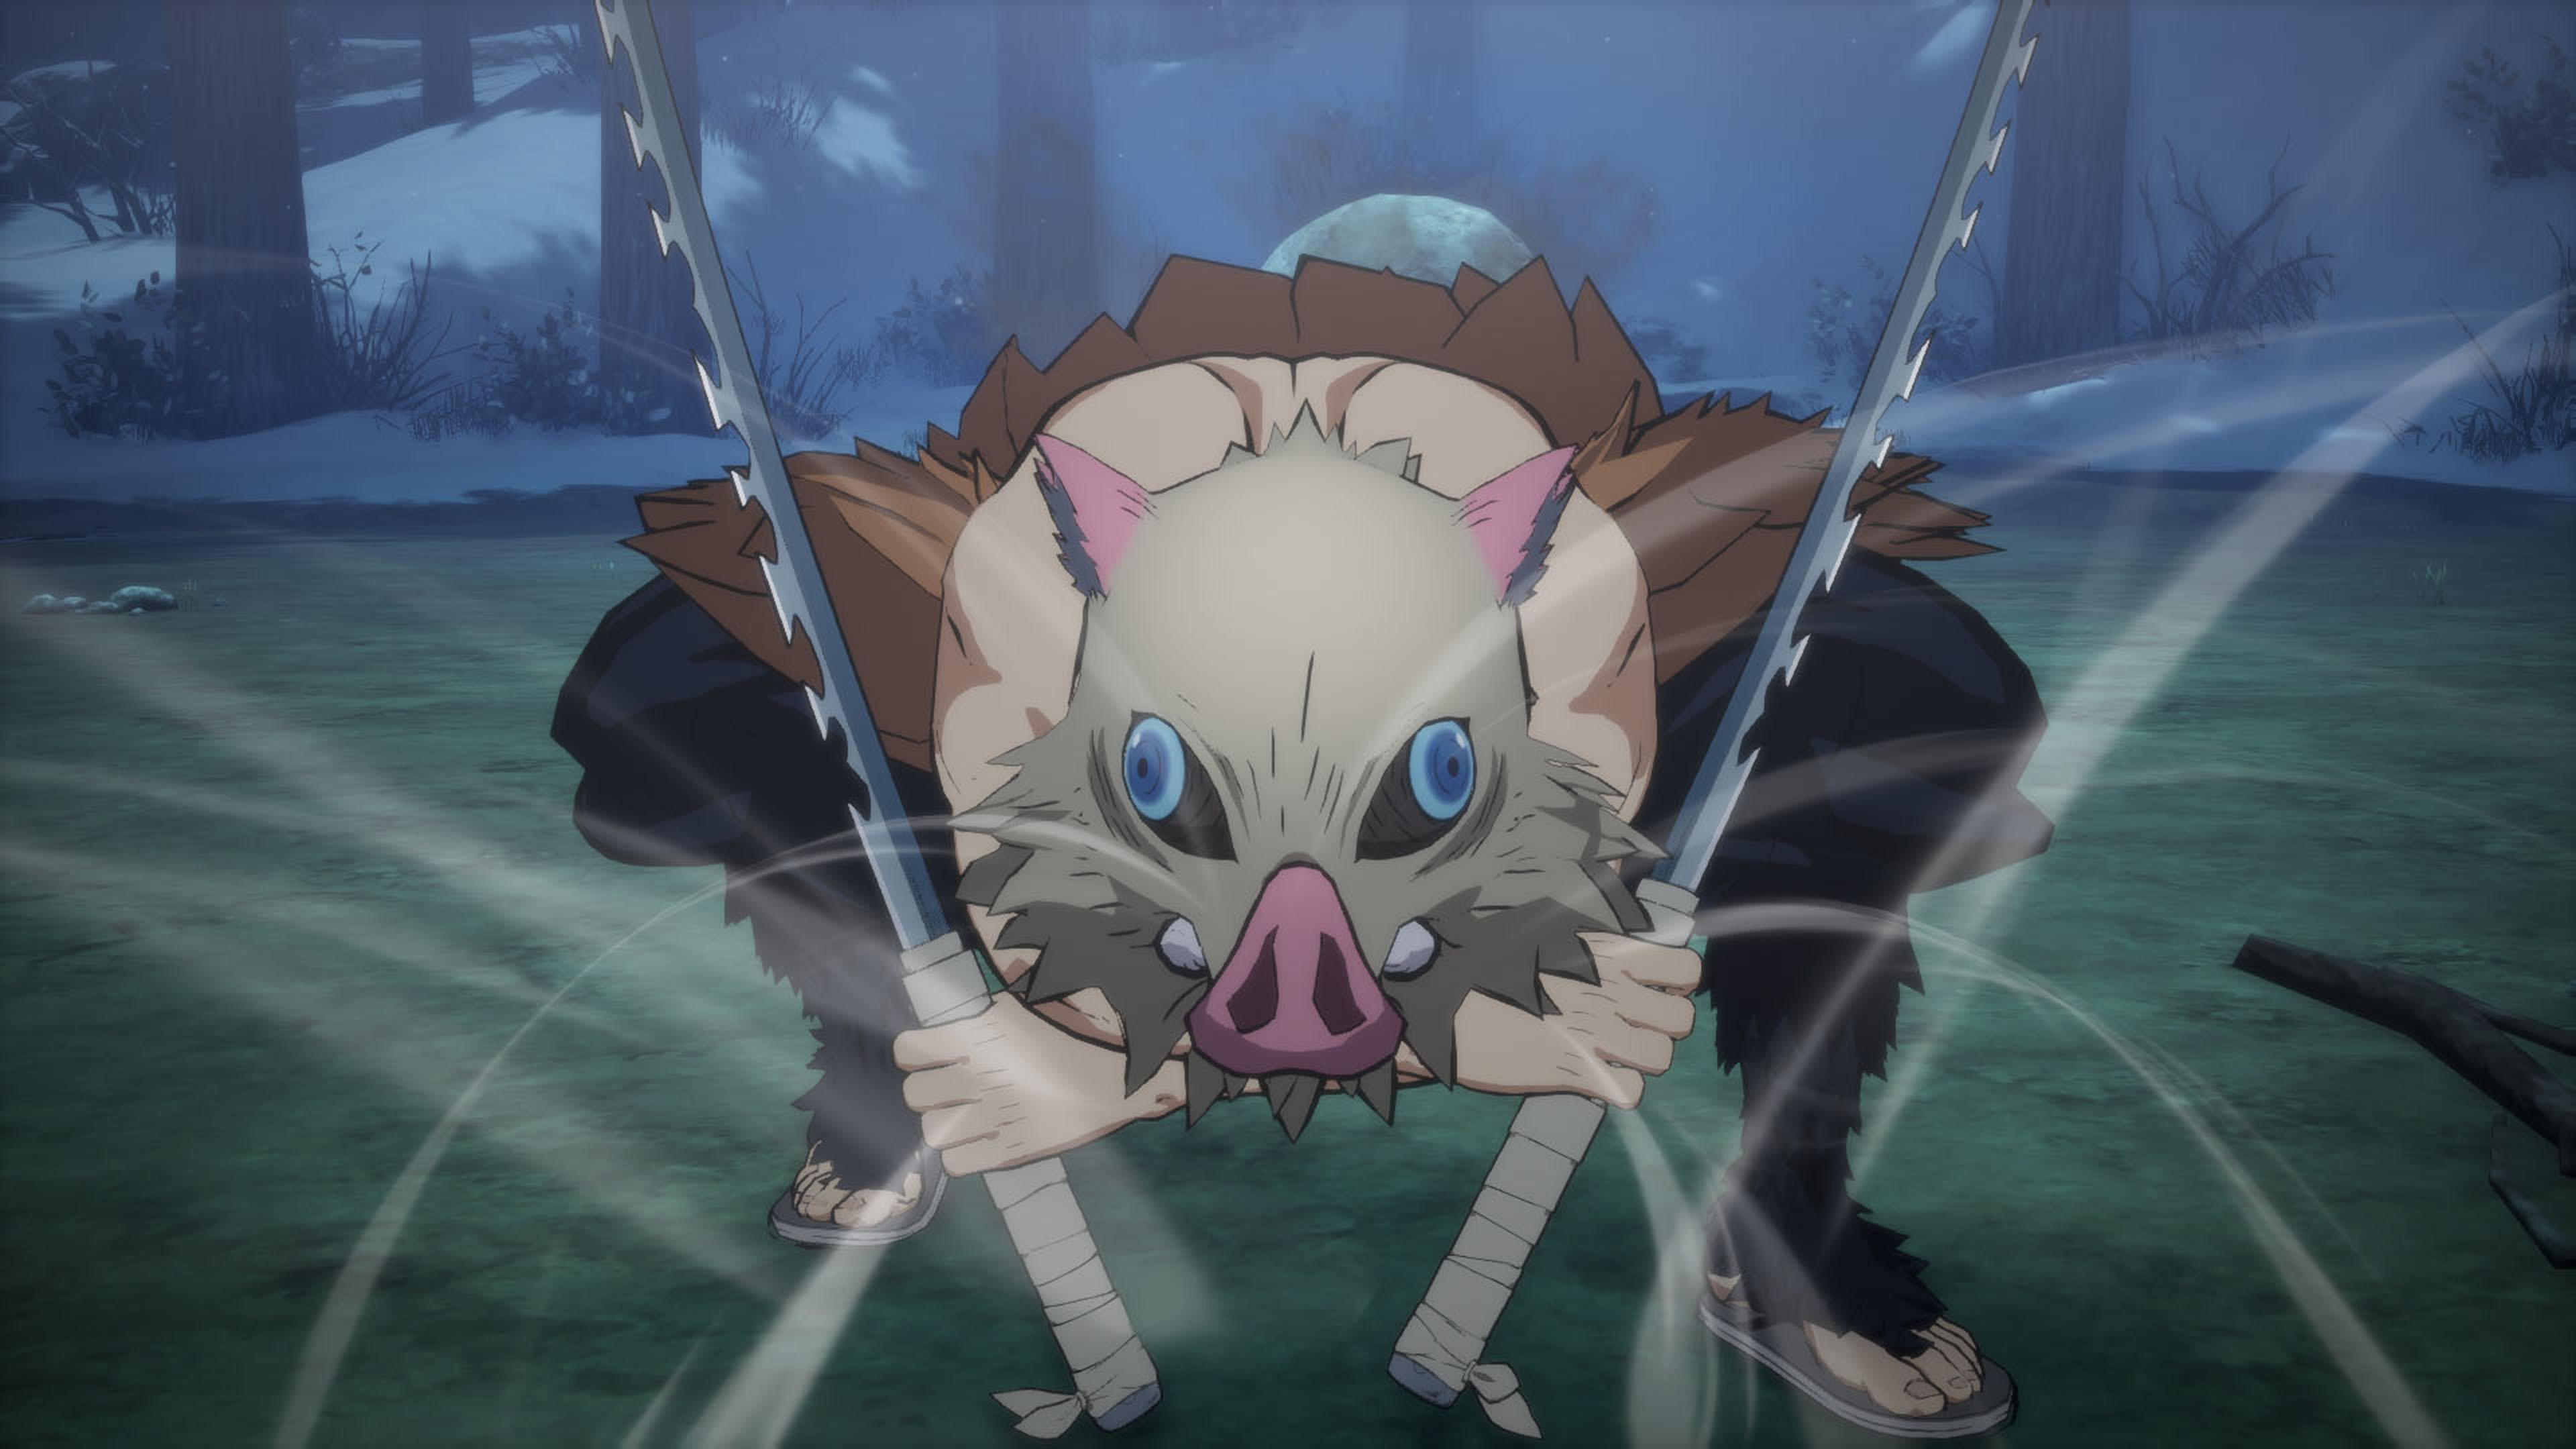 Скриншот №6 к Demon Slayer -Kimetsu no Yaiba- The Hinokami Chronicles Deluxe Edition PS4 and PS5